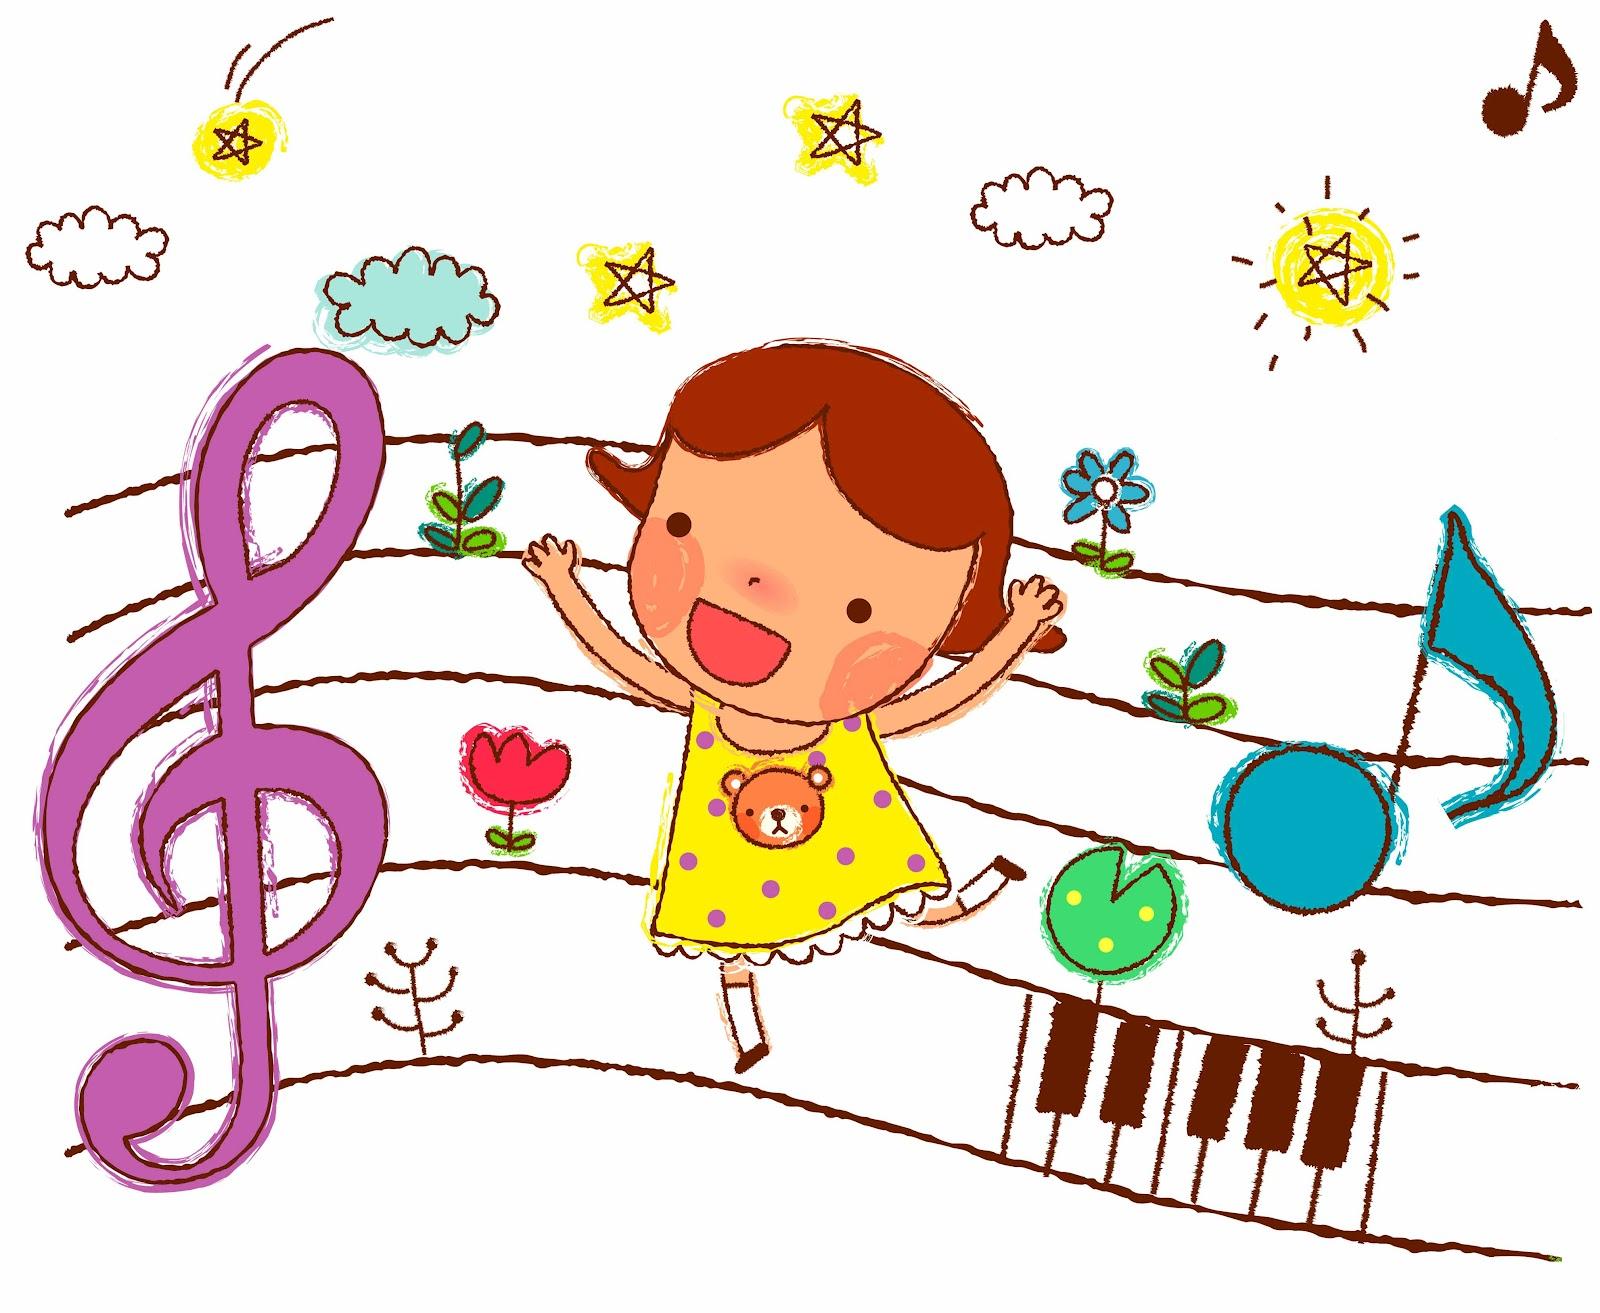 Musical De Ninos Imagenes